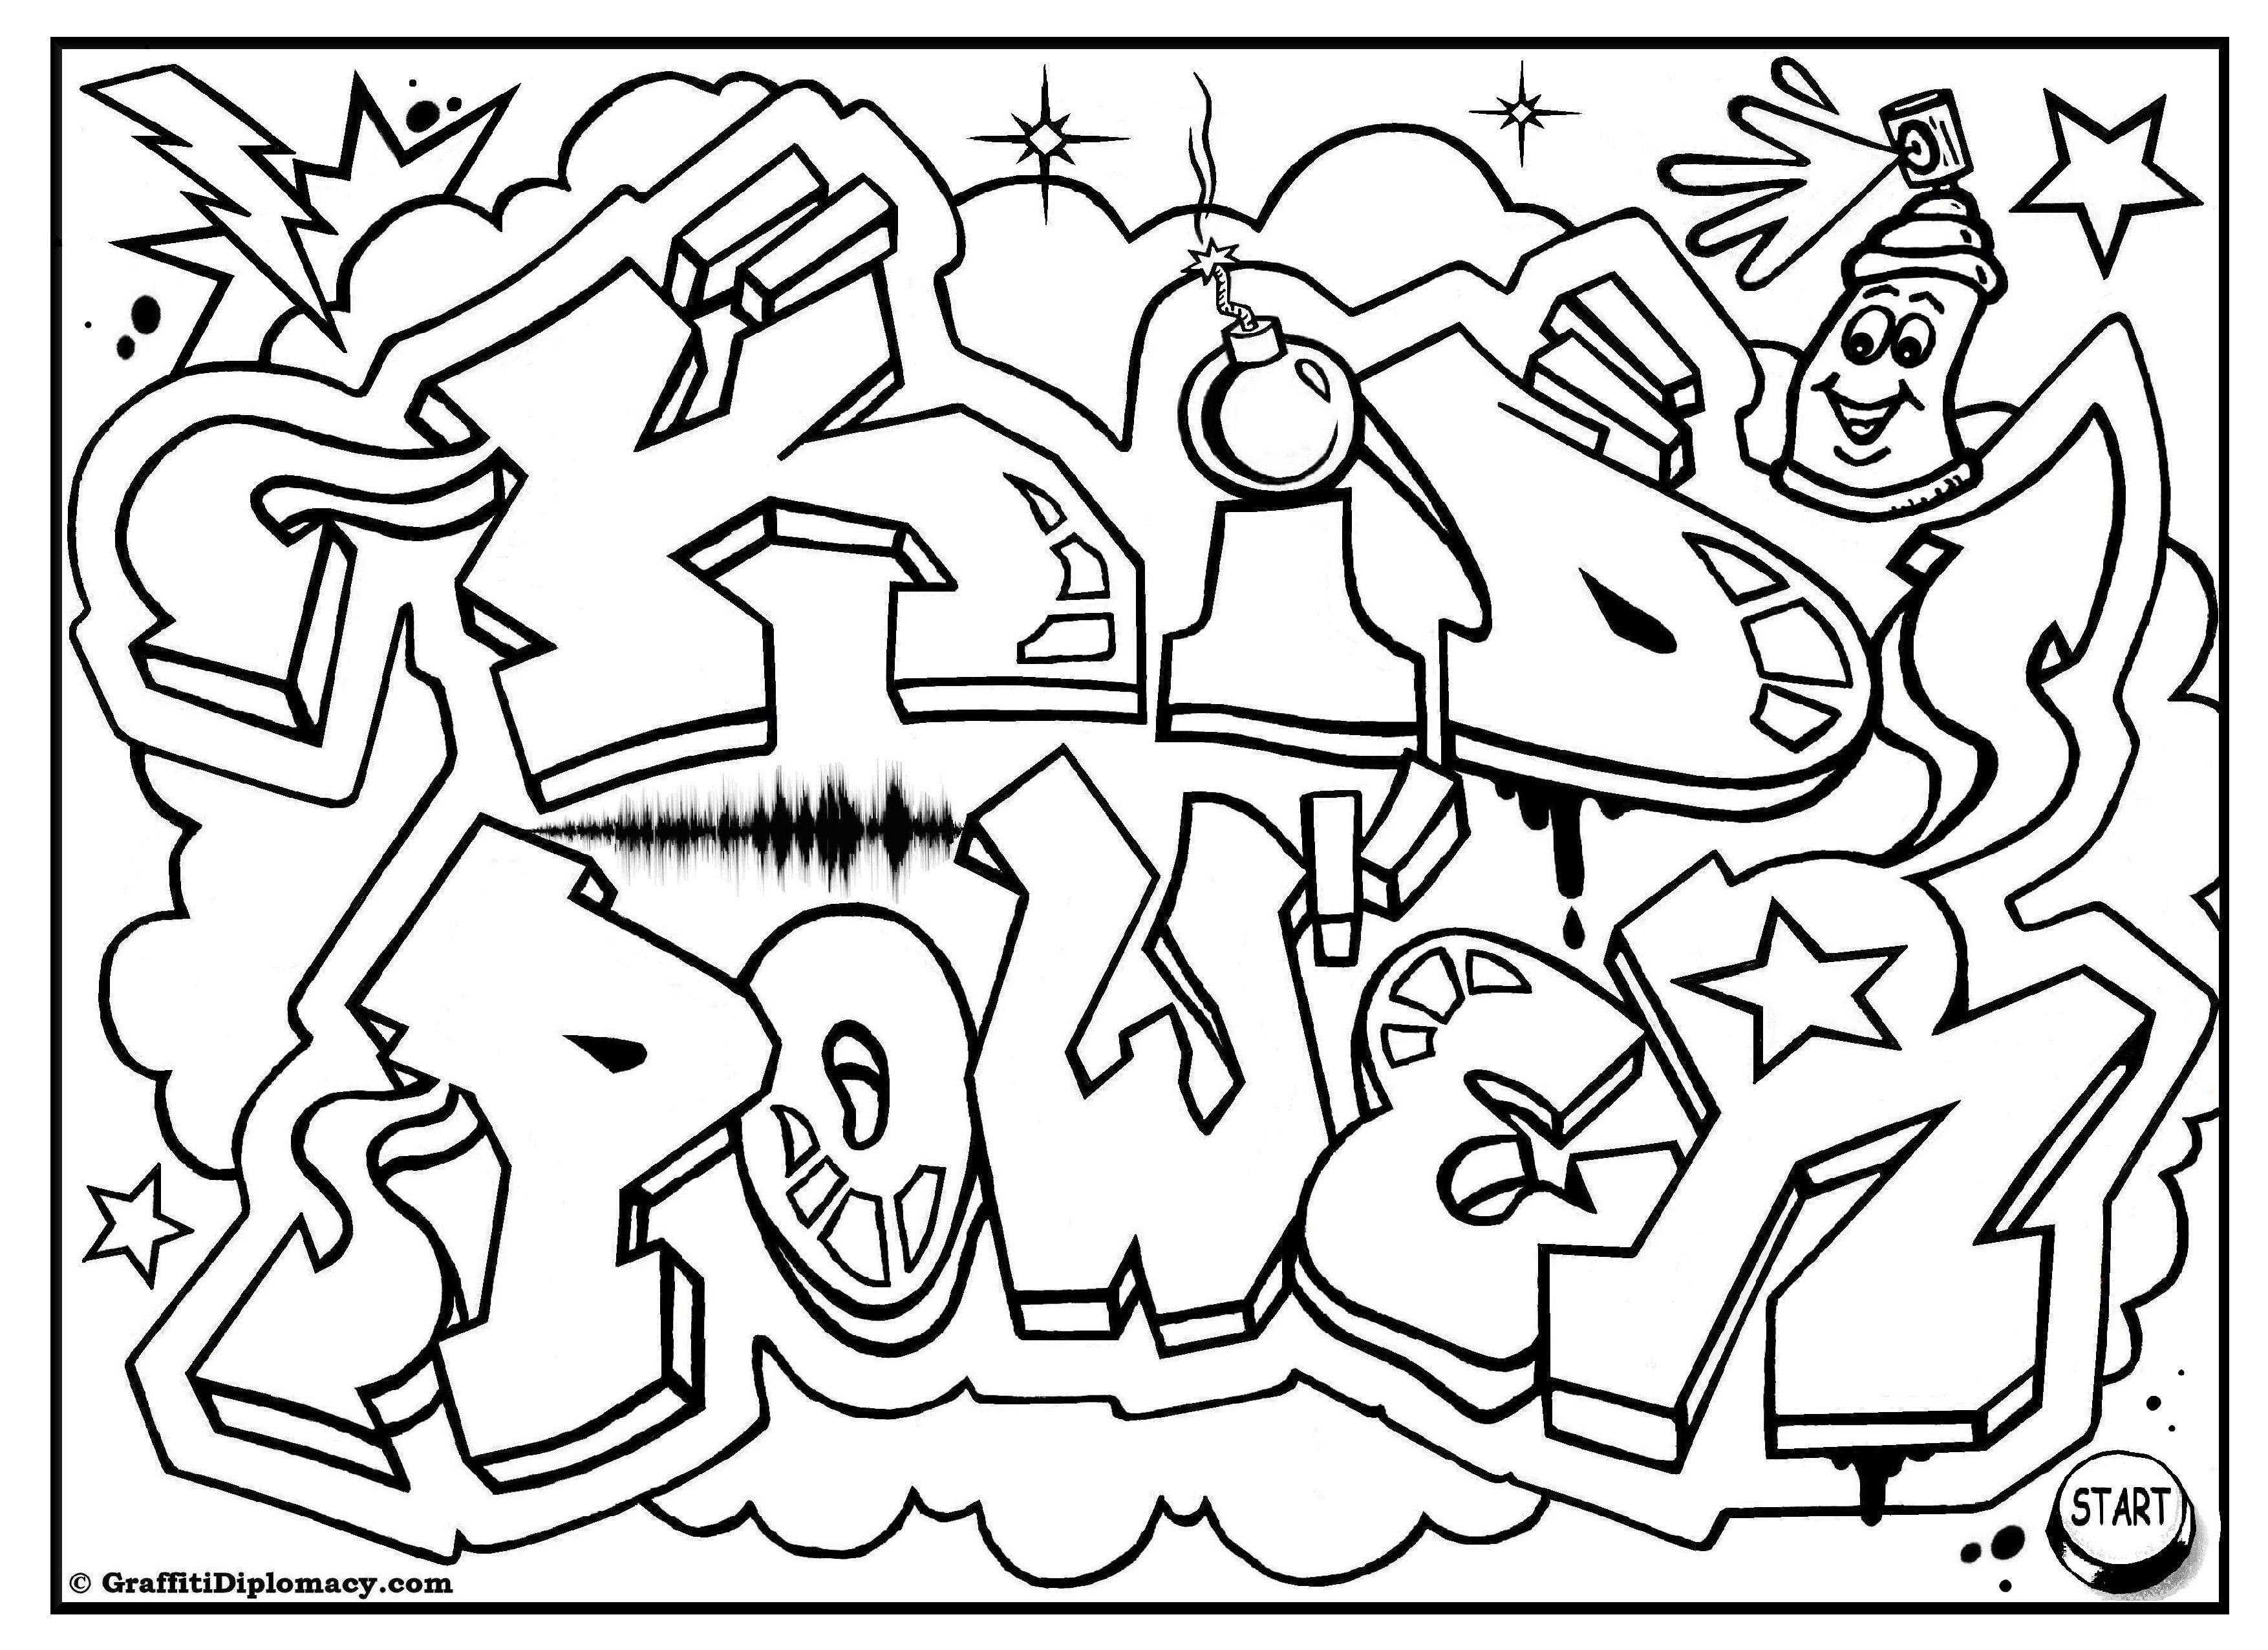 KID POWER free graffiti coloring page, free printable, colouring